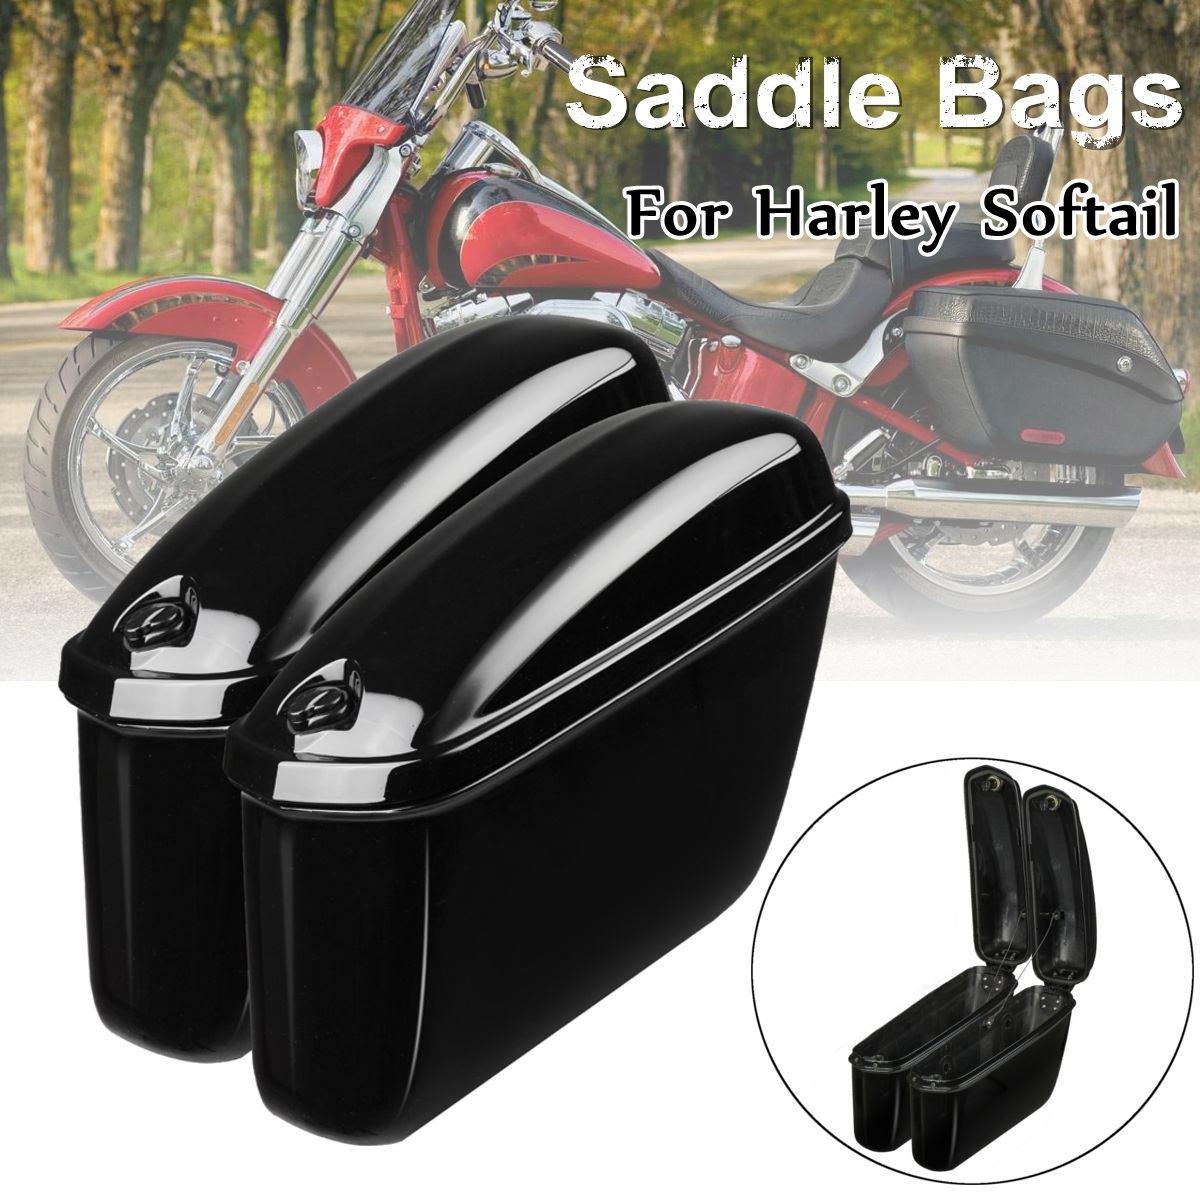 Paire sacoches moto malle latérale rangement bagages boîte rigide pochette à outils pour Harley Softail Sportster